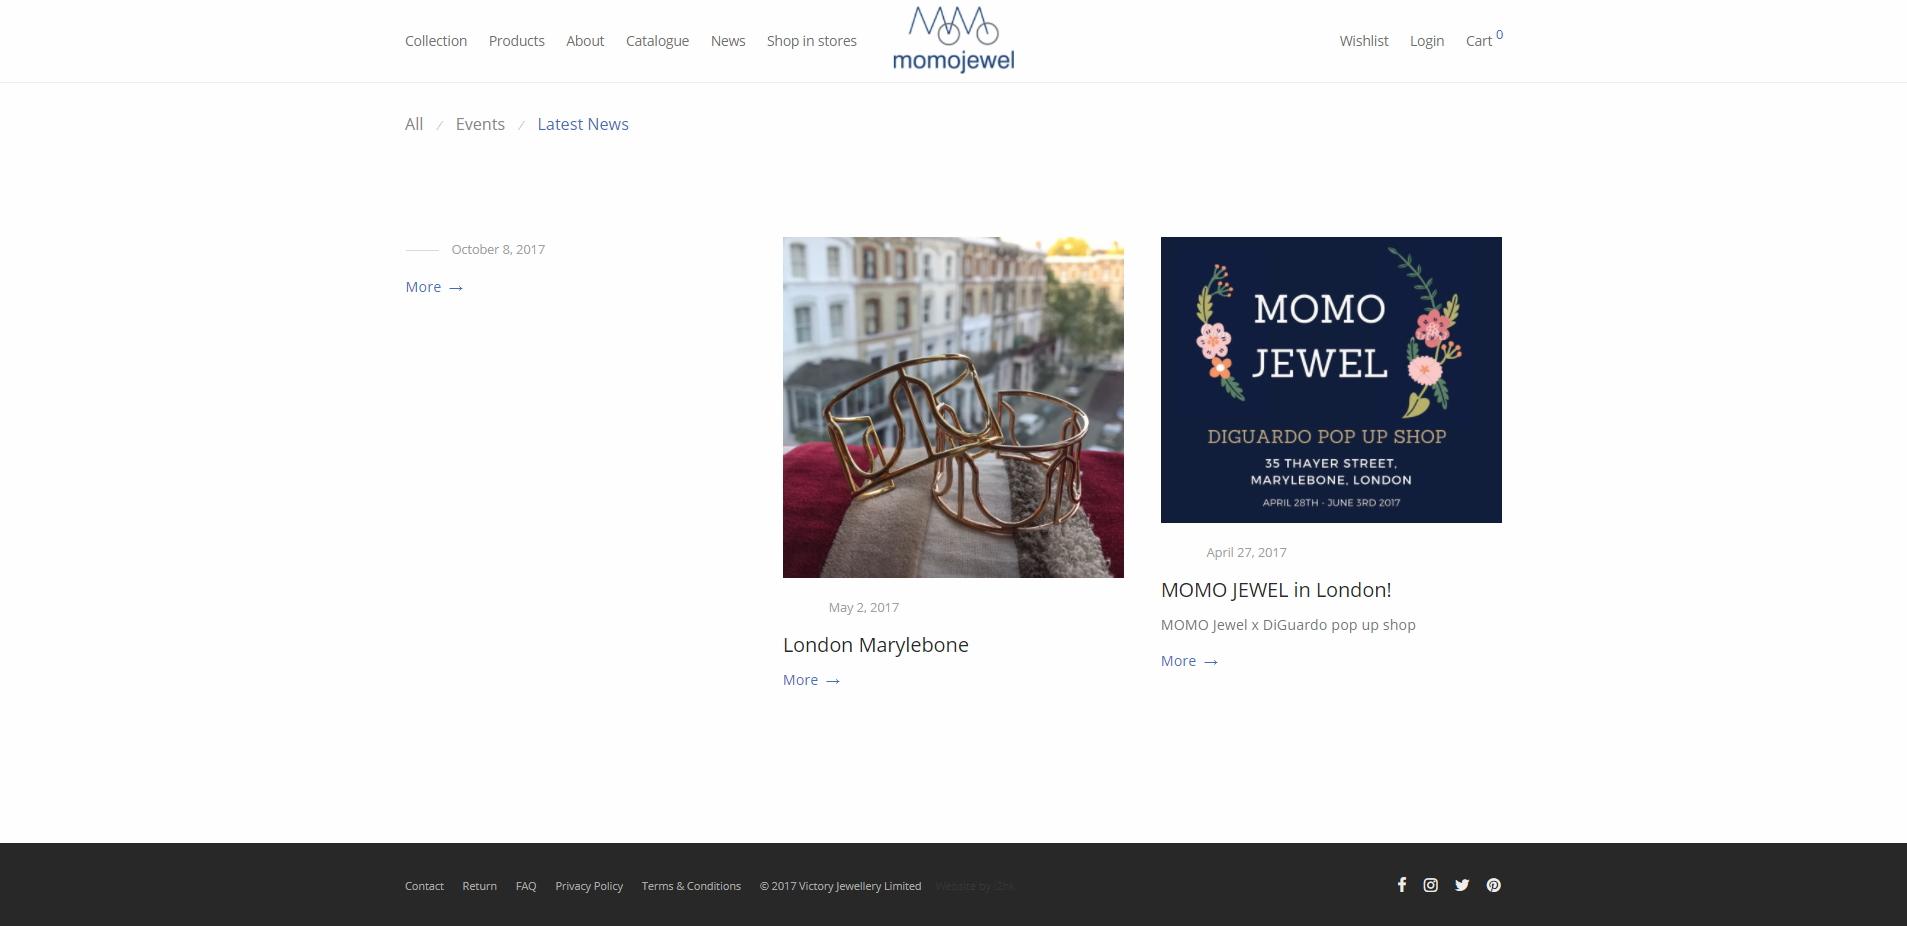 MOMOJEWEL blog